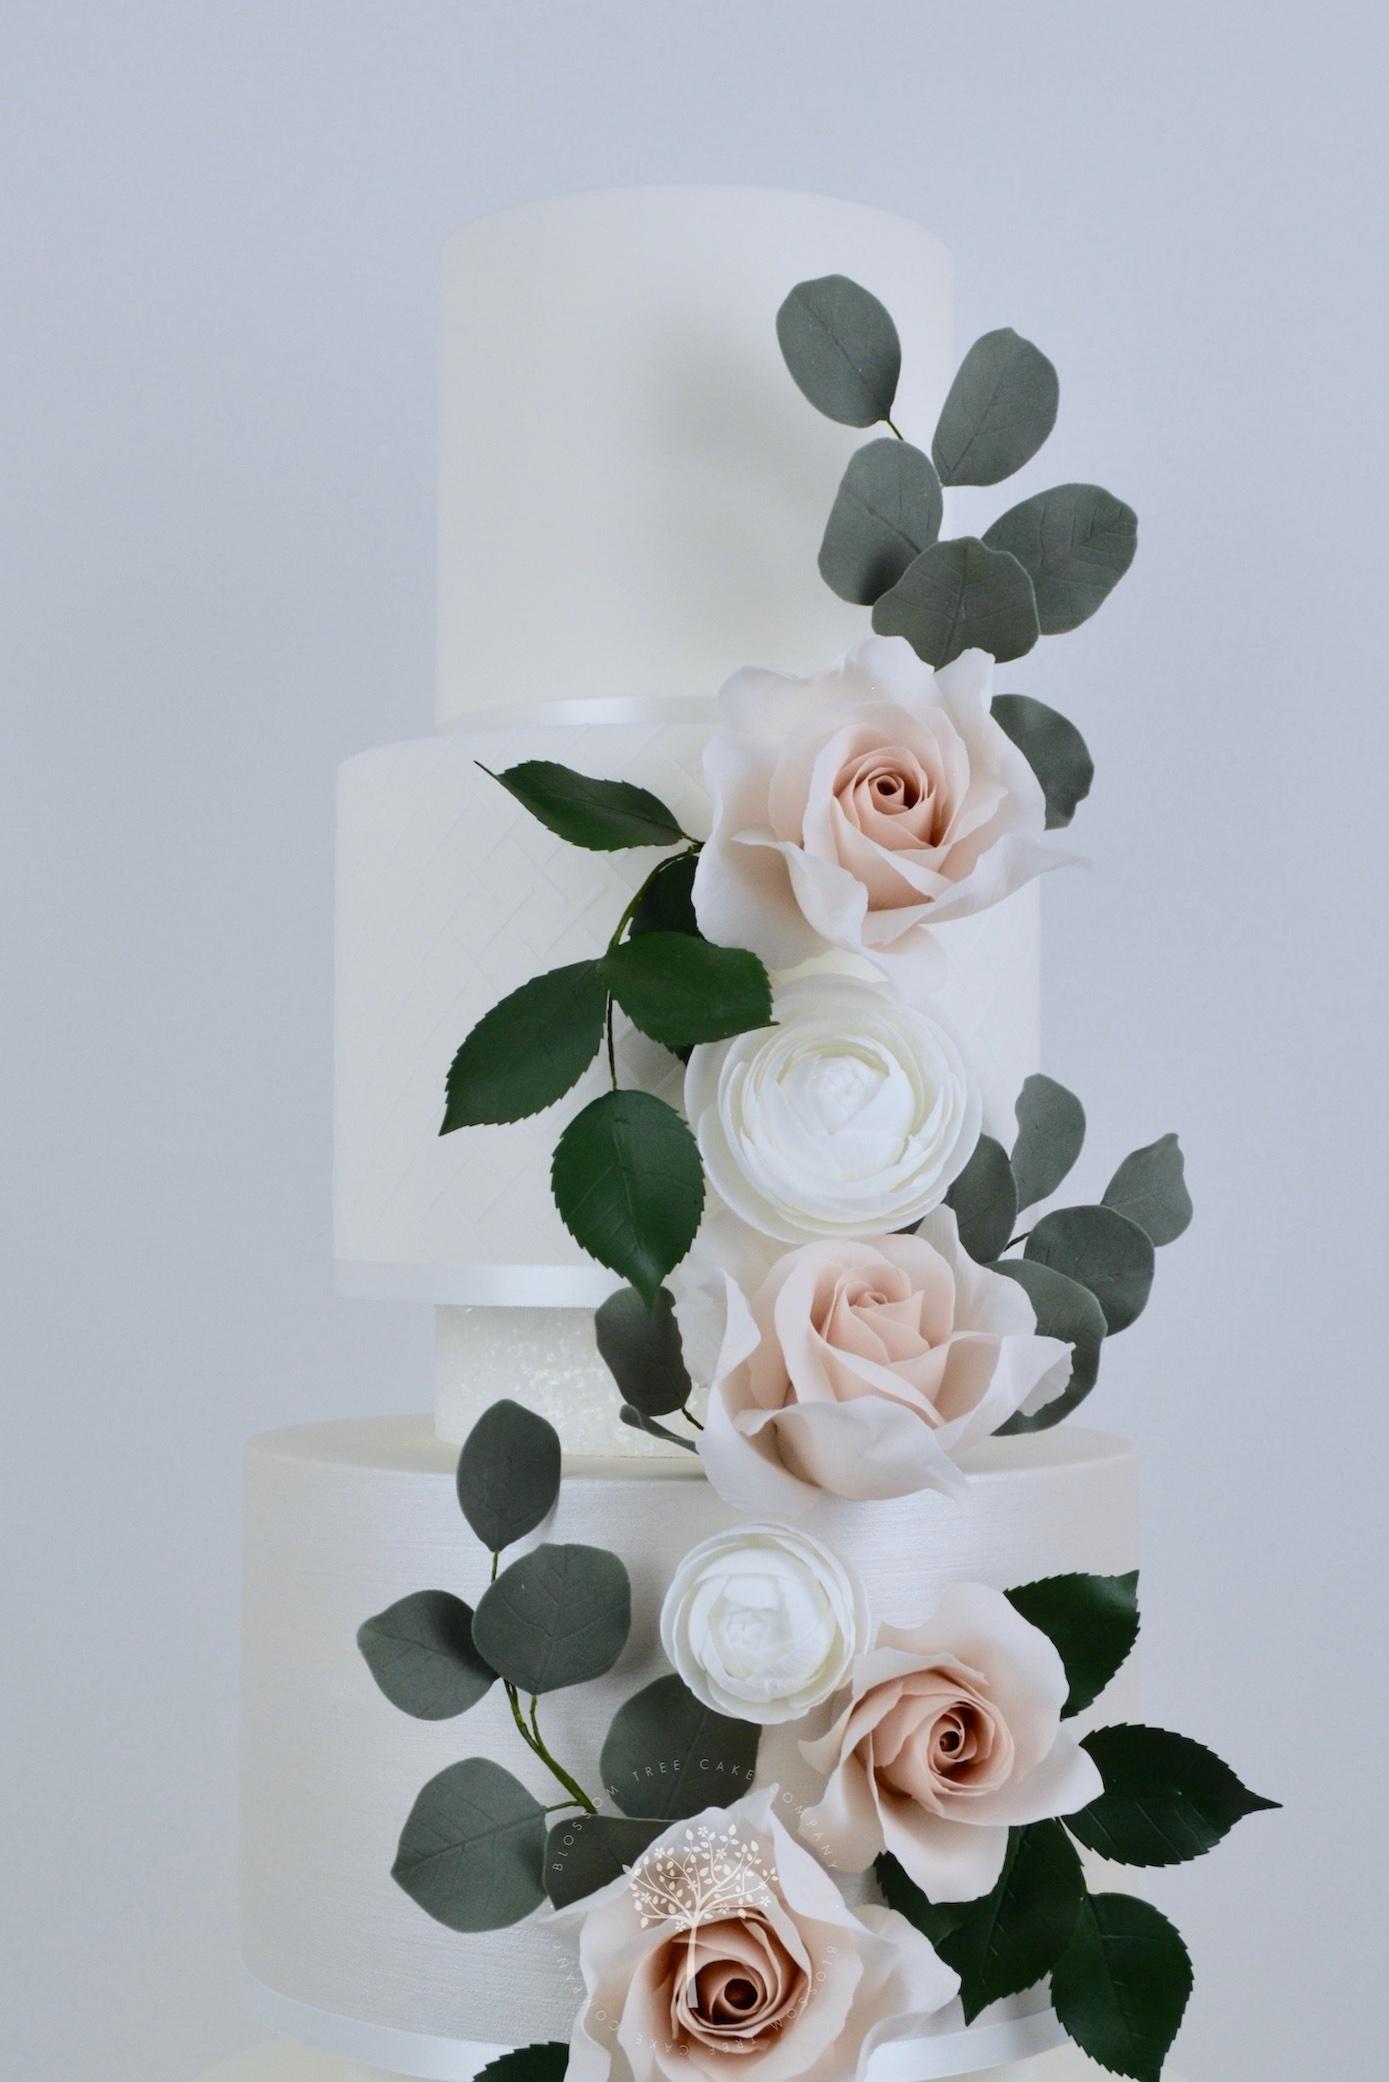 Rose & Ranunculus Cascade wedding cake by Blossom Tree Cake Company Harrogate North Yorkshire - top sugar flowers.jpg